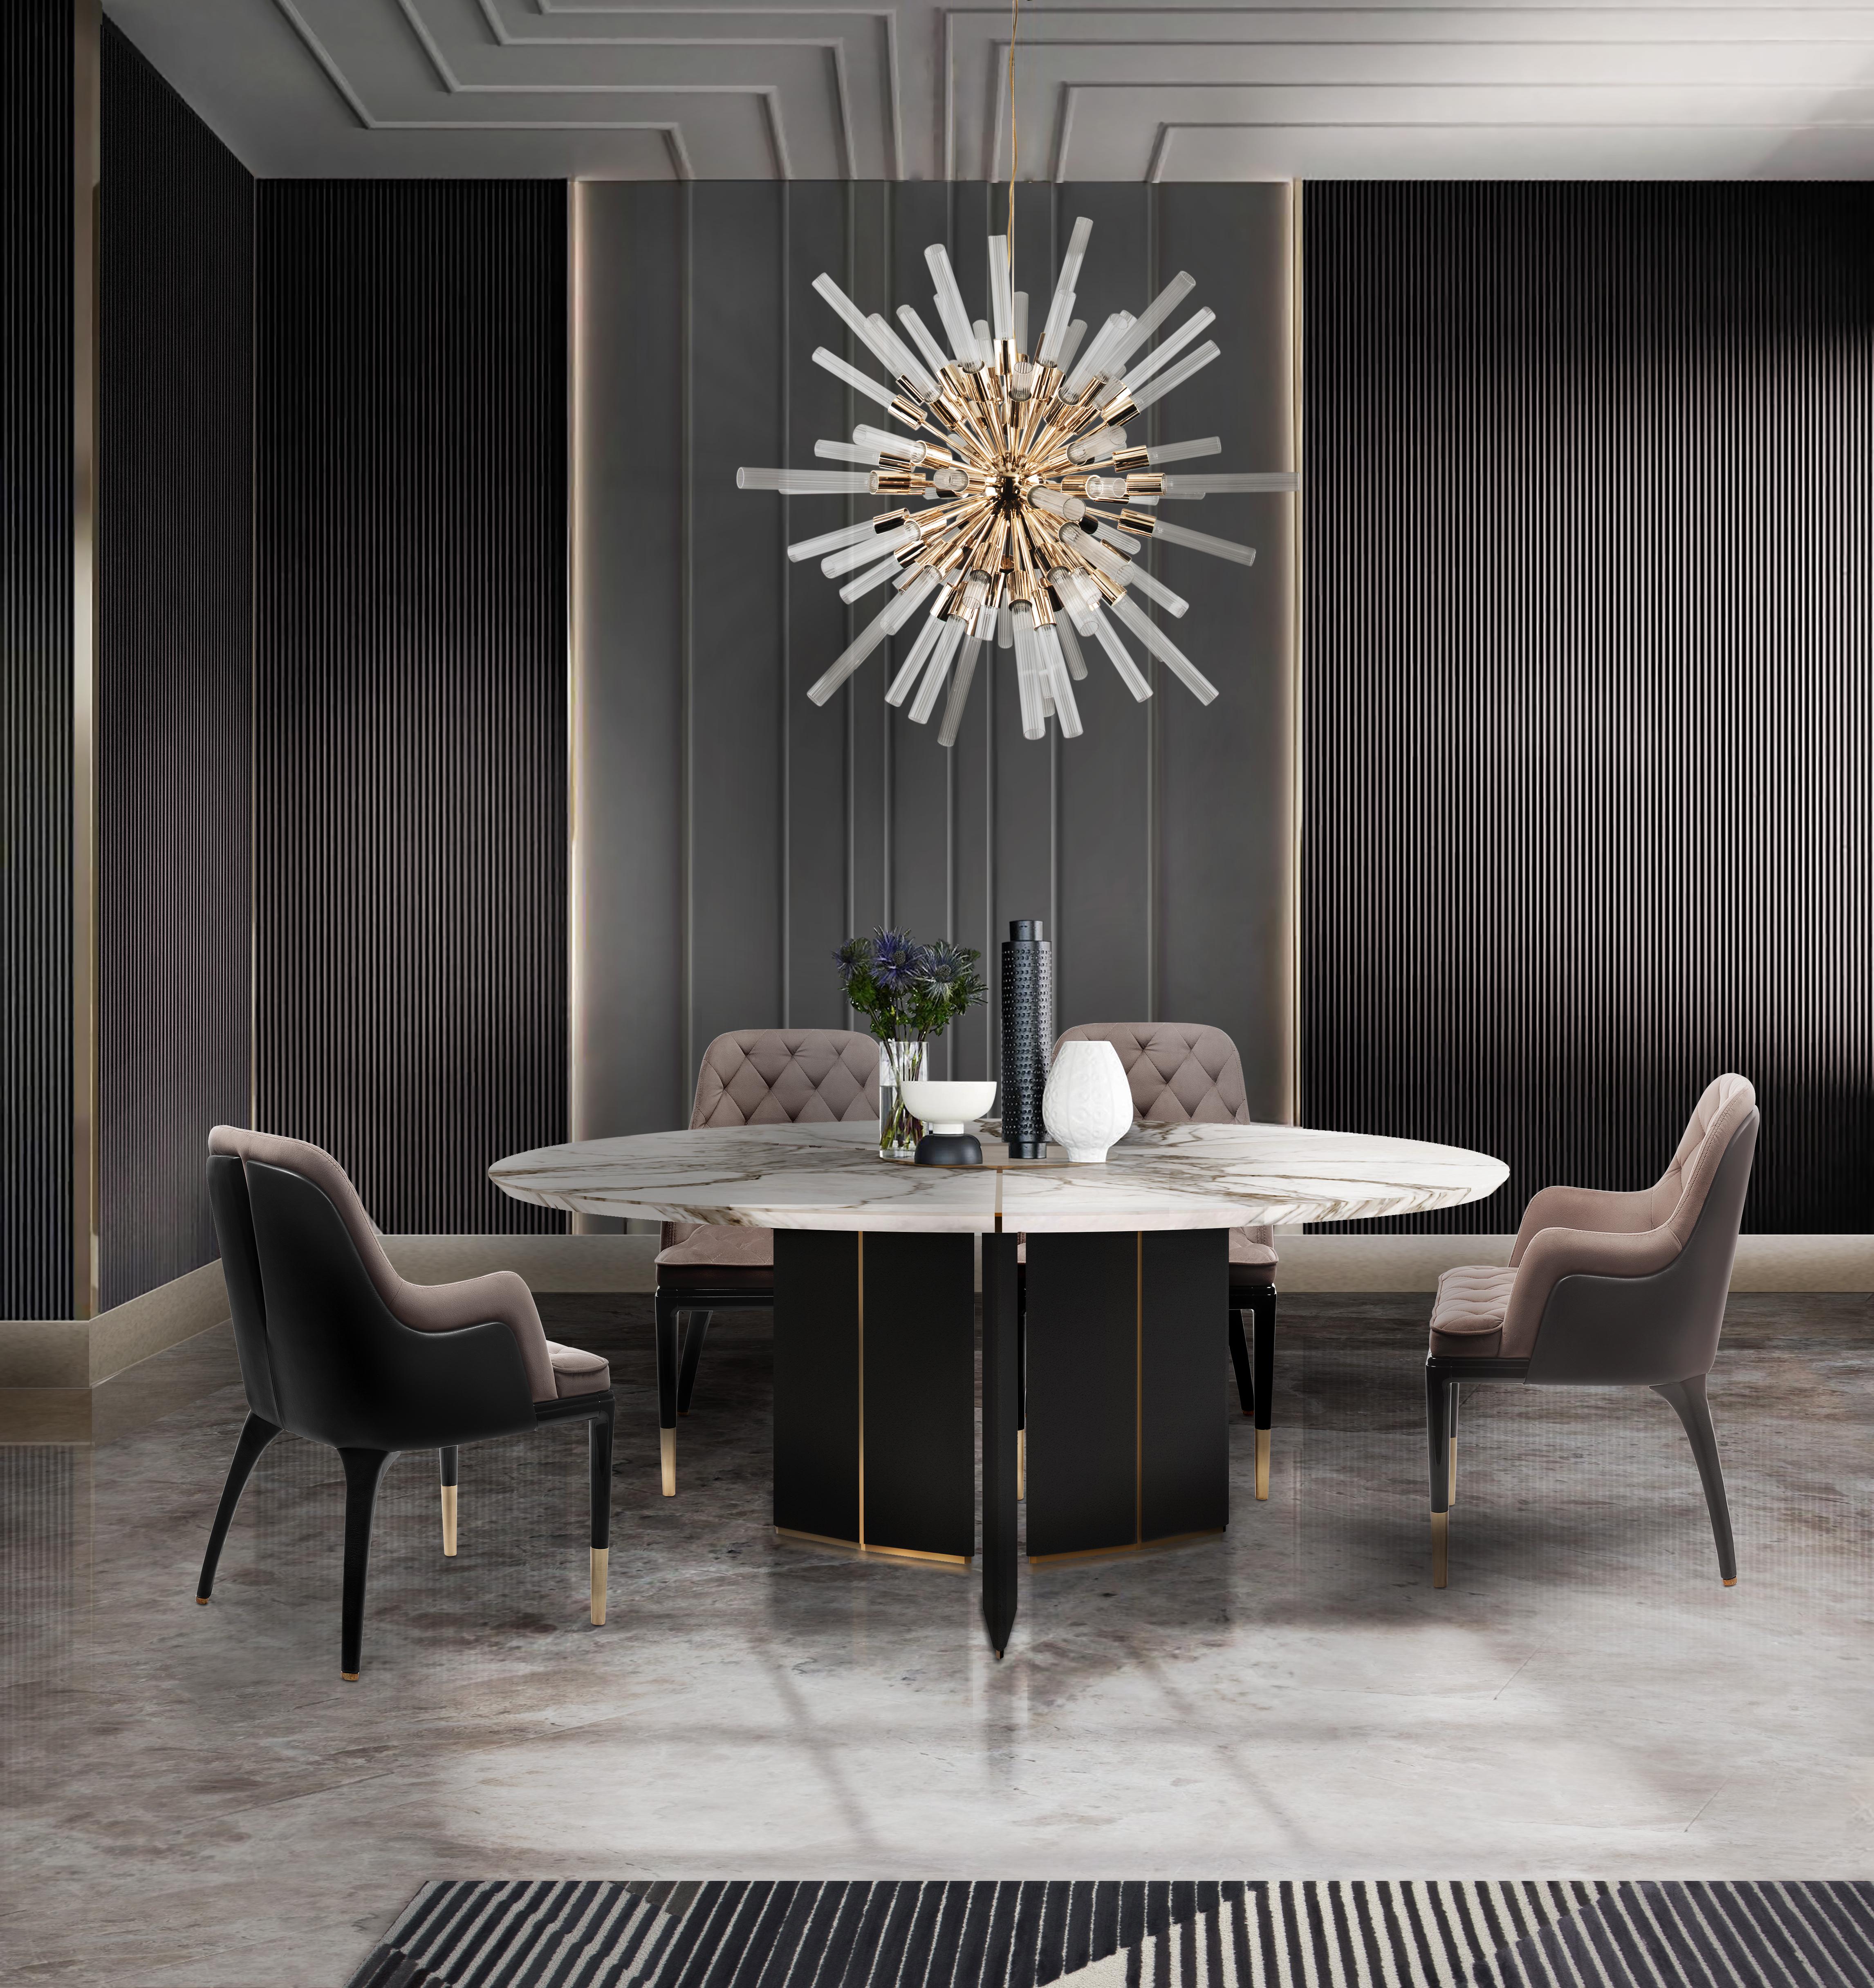 Dining Room Lighting Ideas Never Seen Before